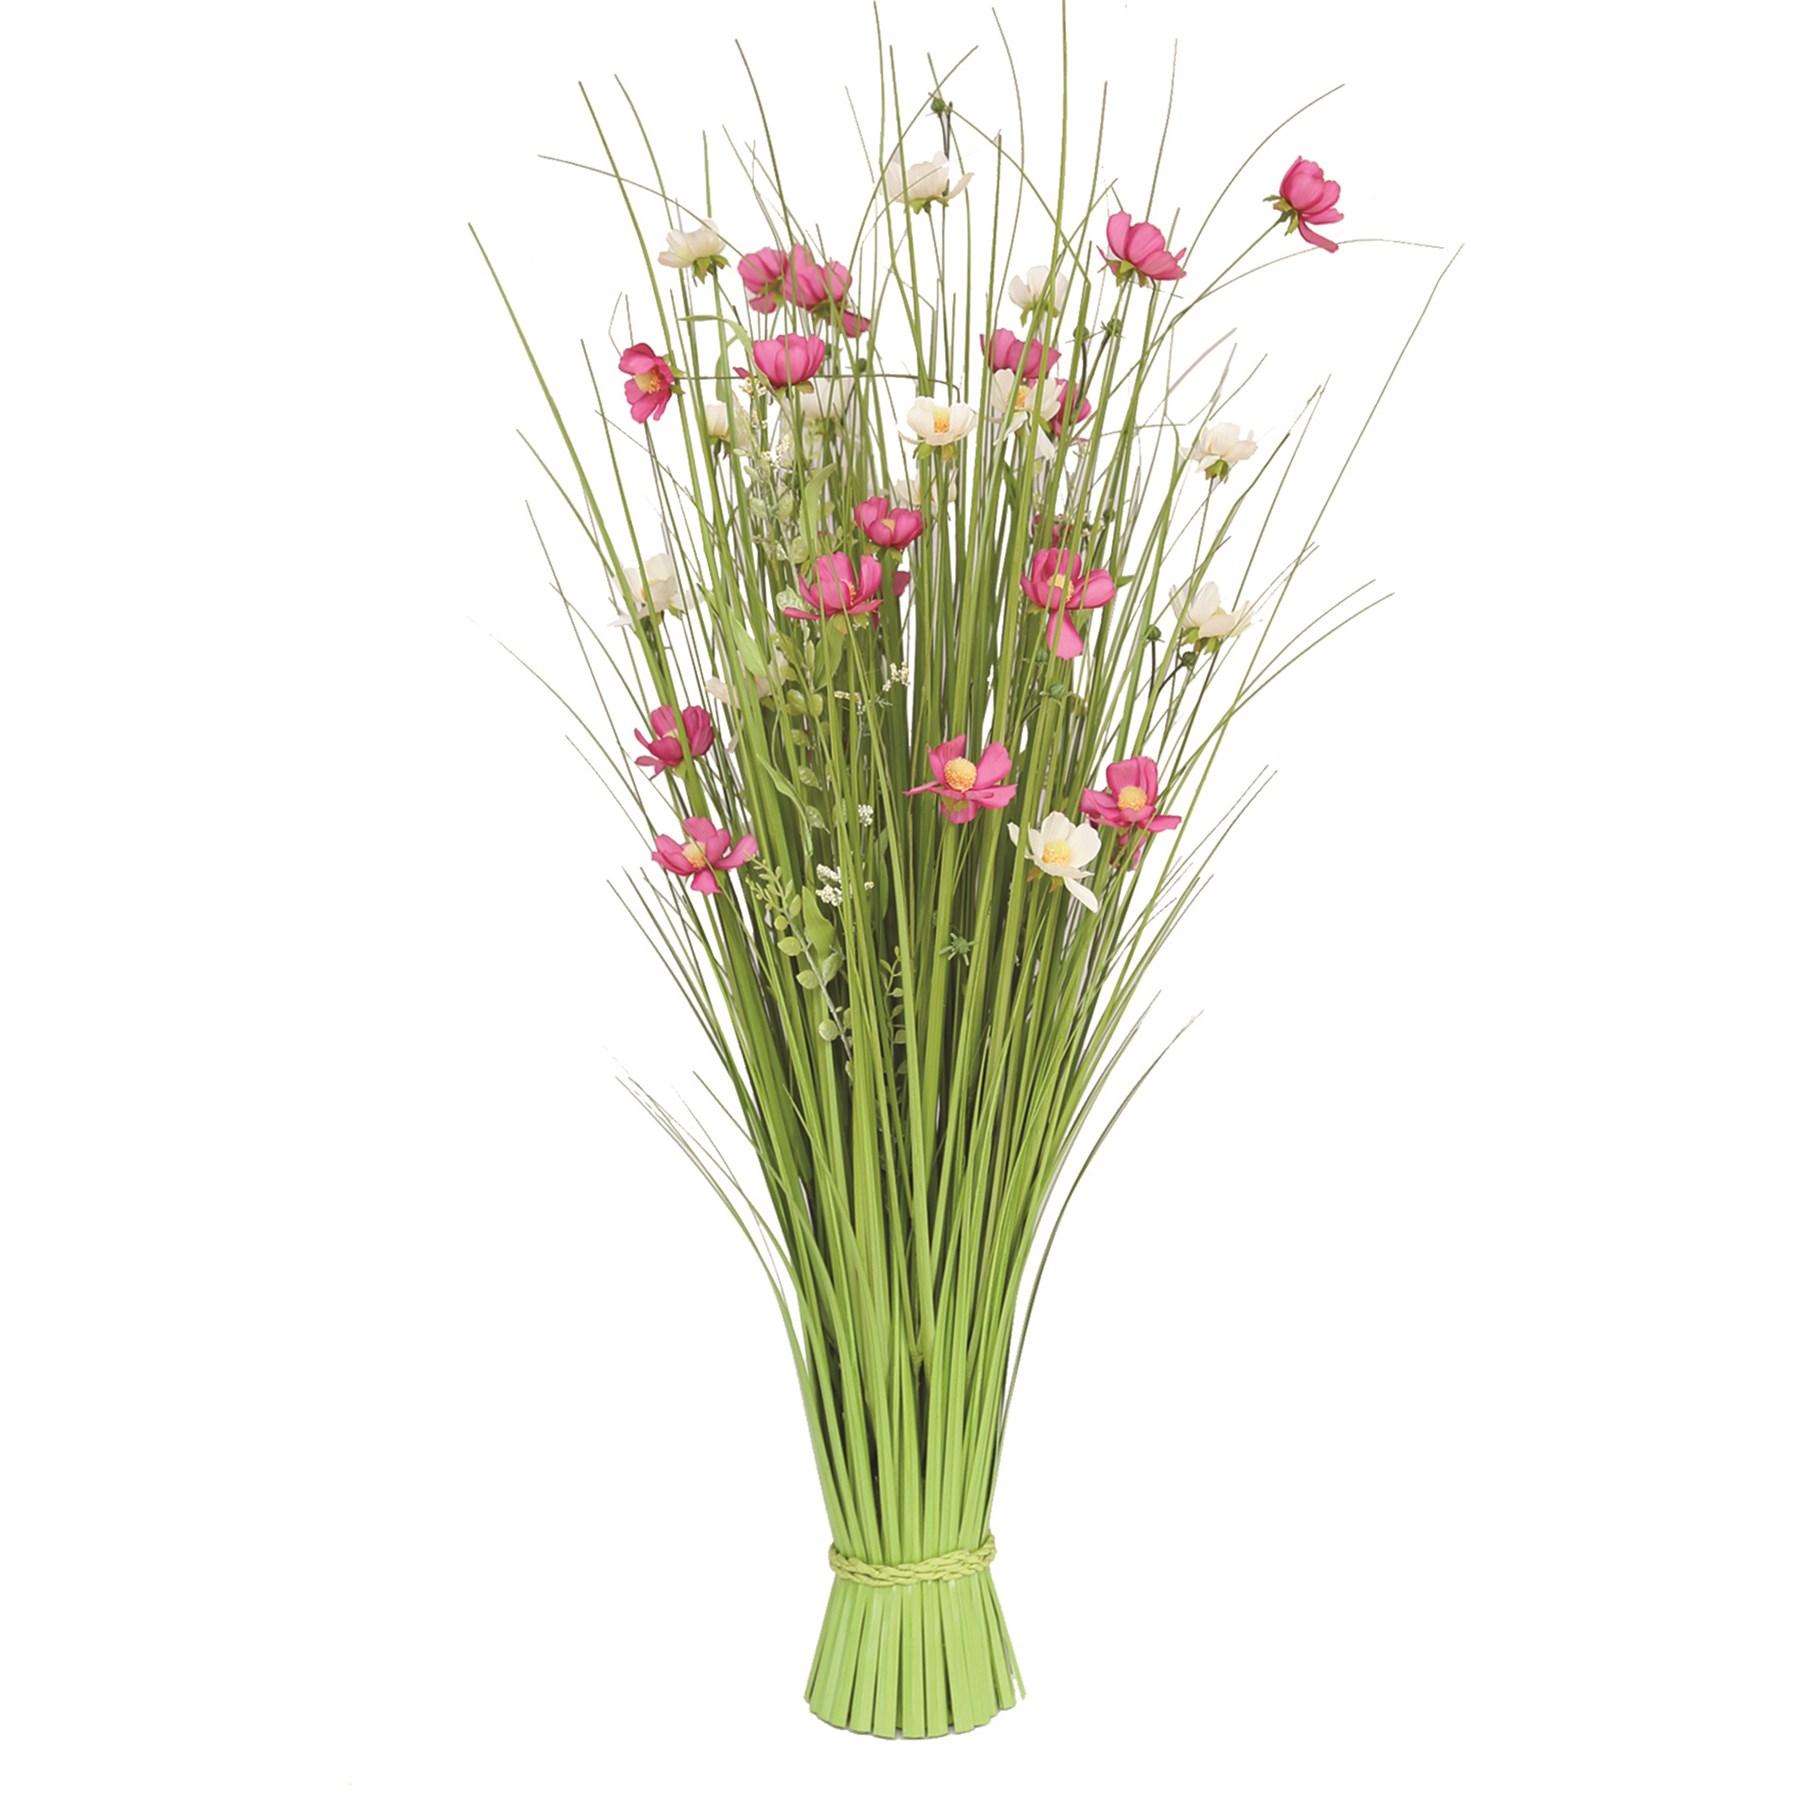 Grass Bundle Mixed Flowers 100cm